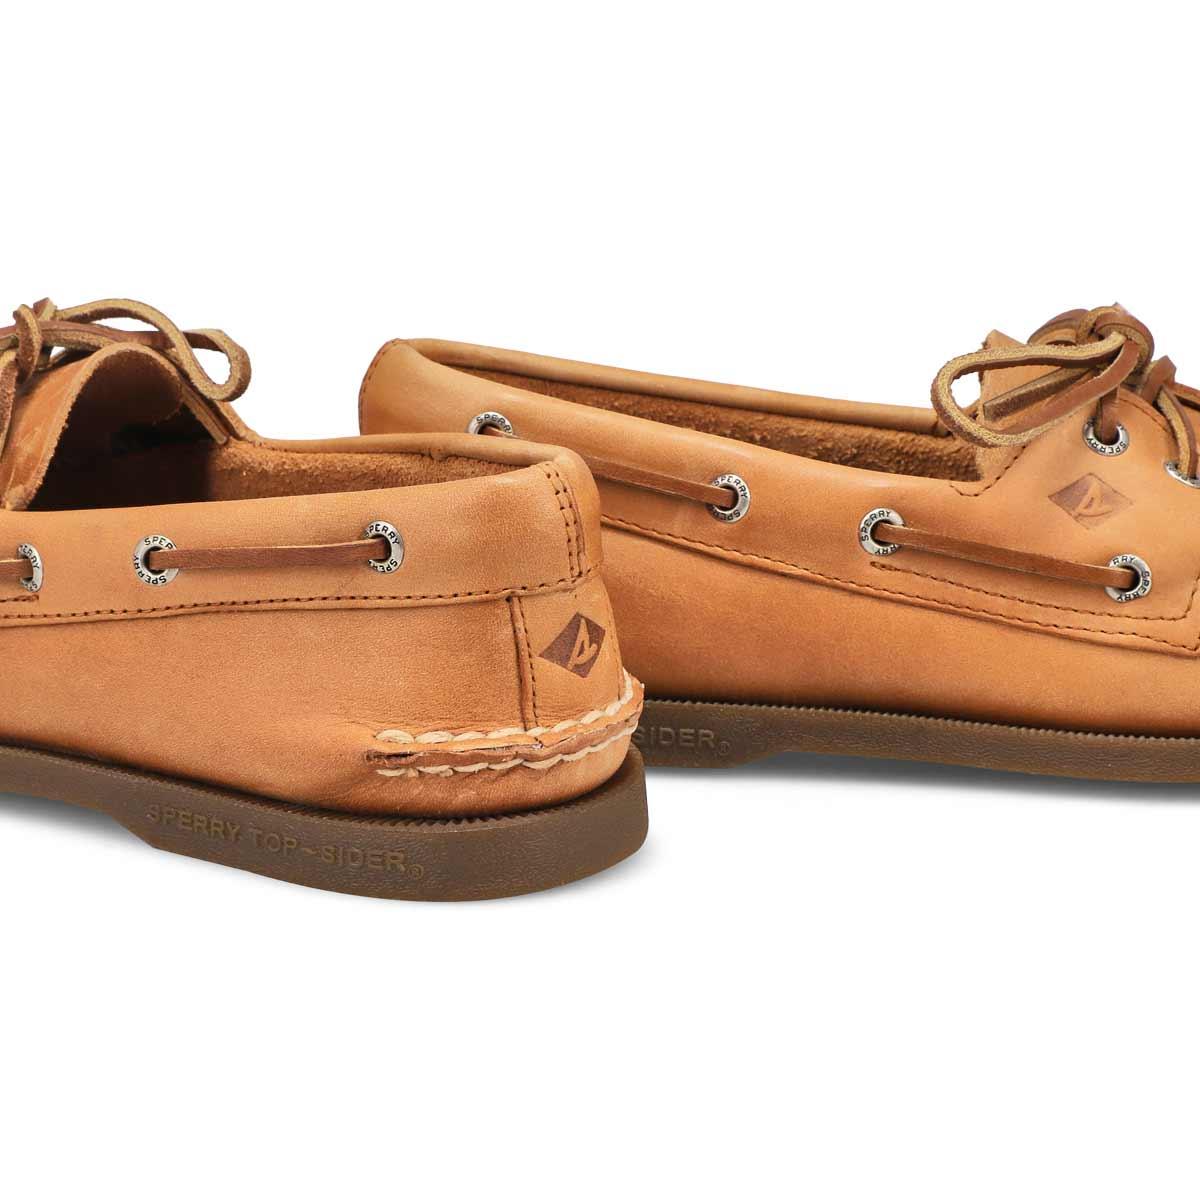 Mns A/O 2 eye sahara brn boat shoe